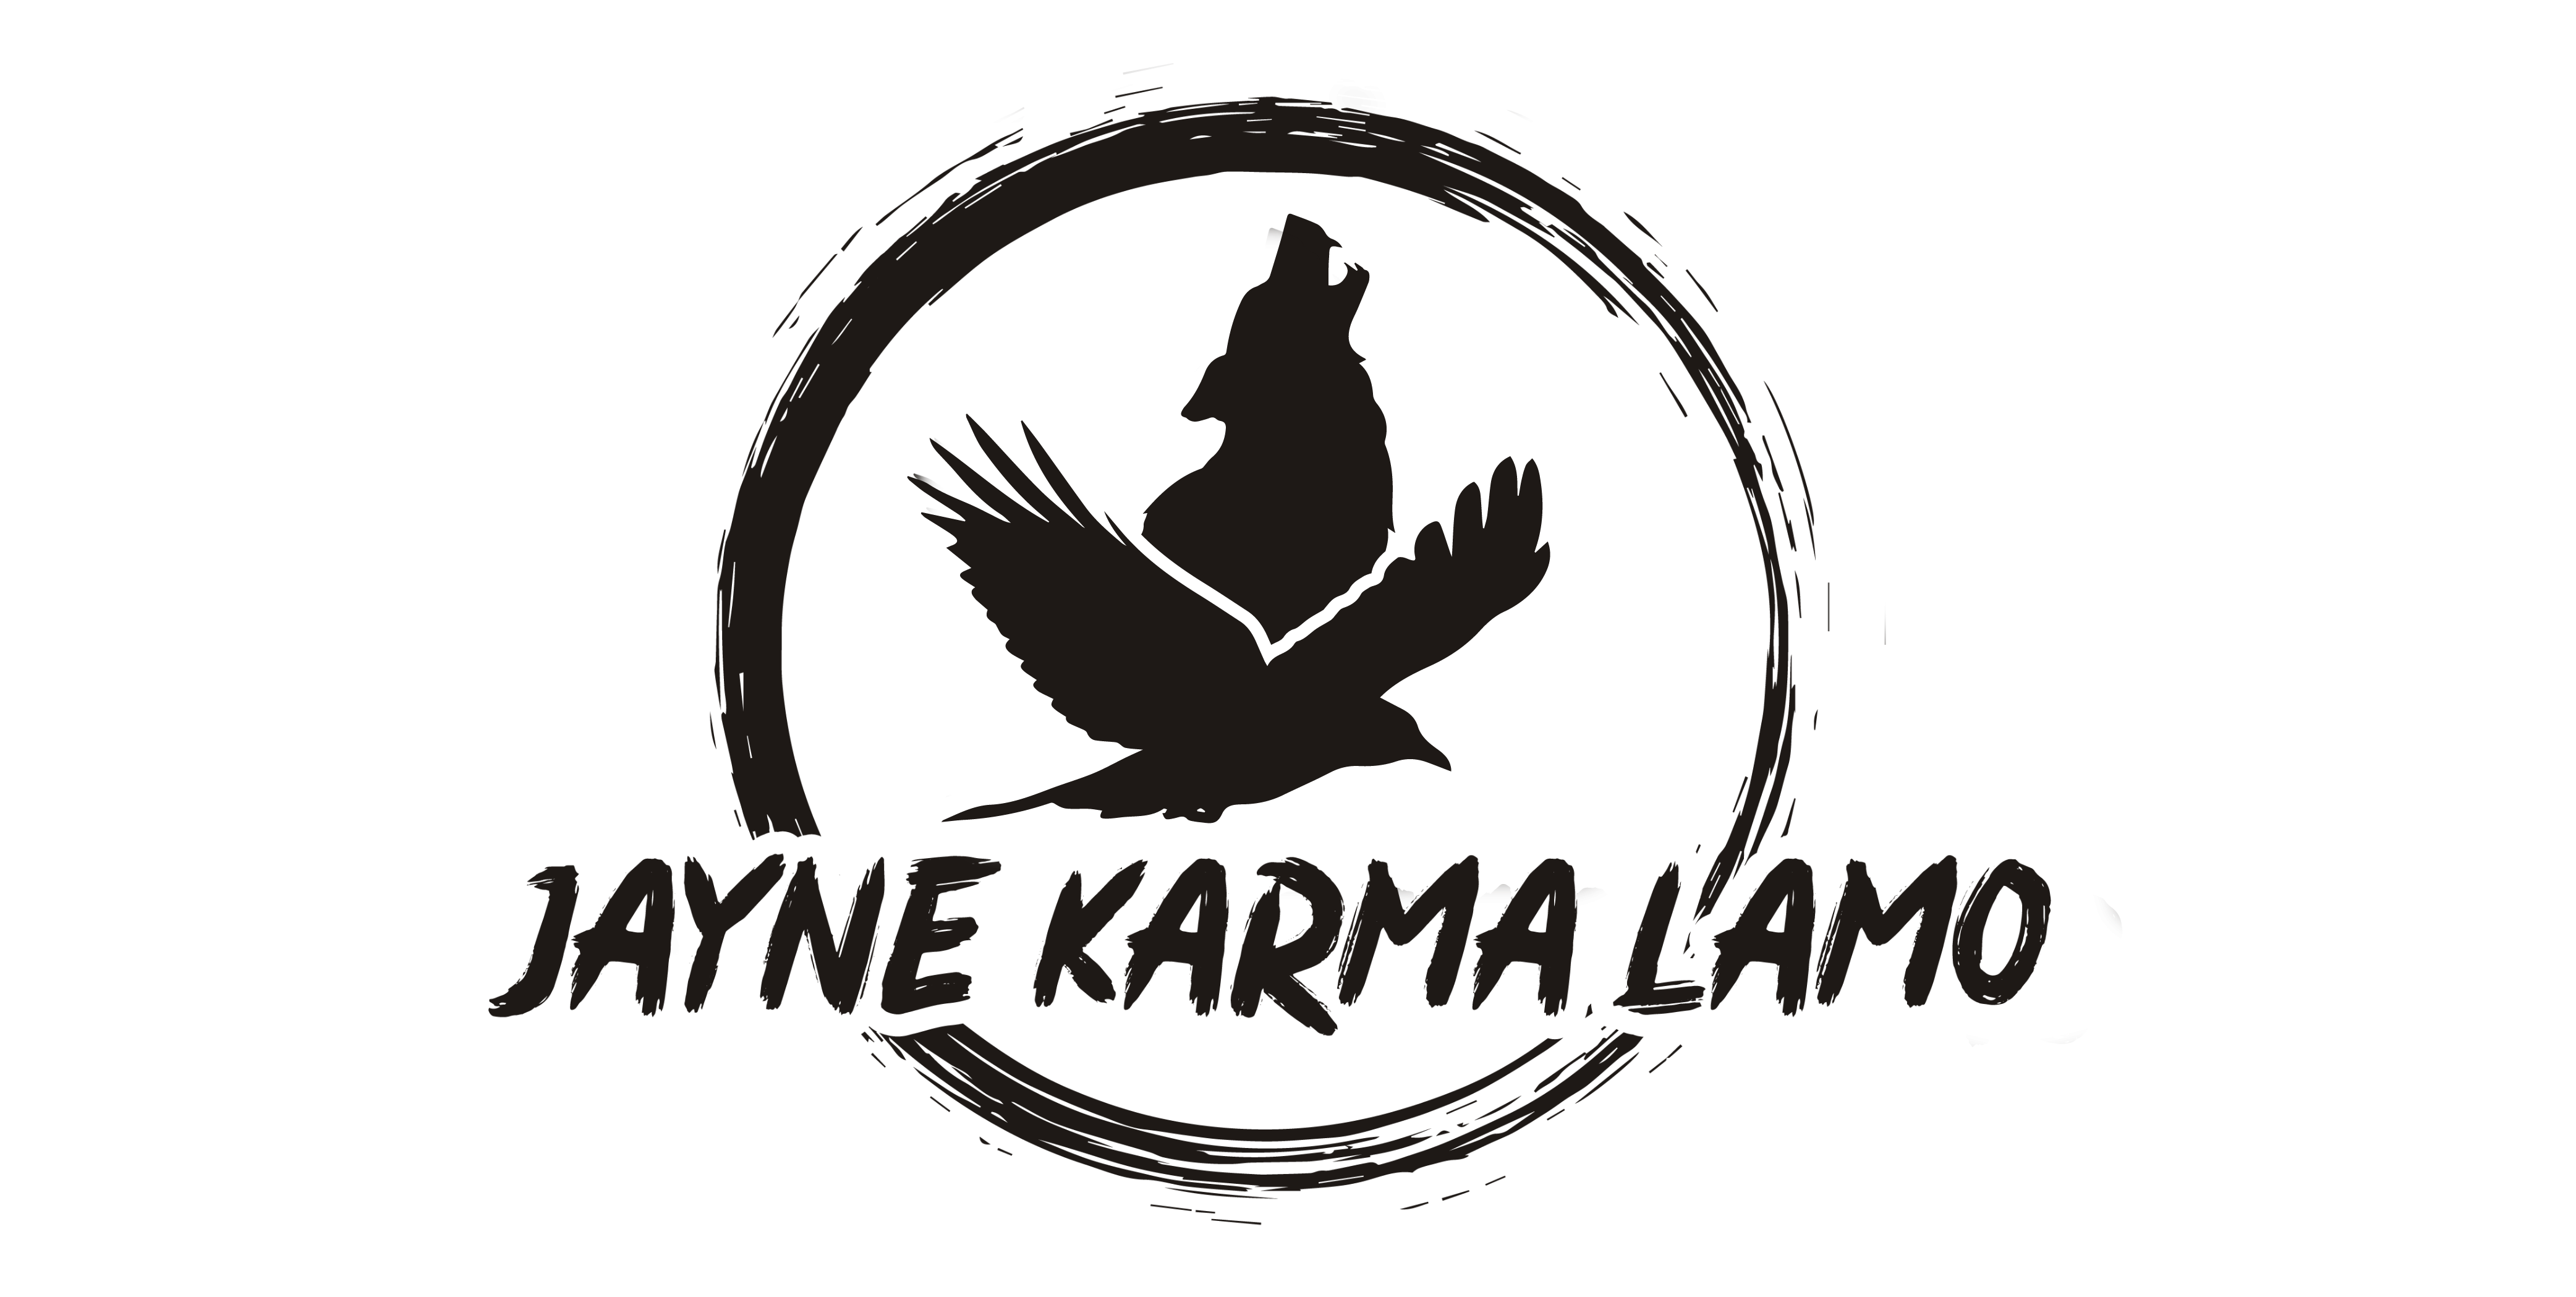 Jayne Karma Lamo